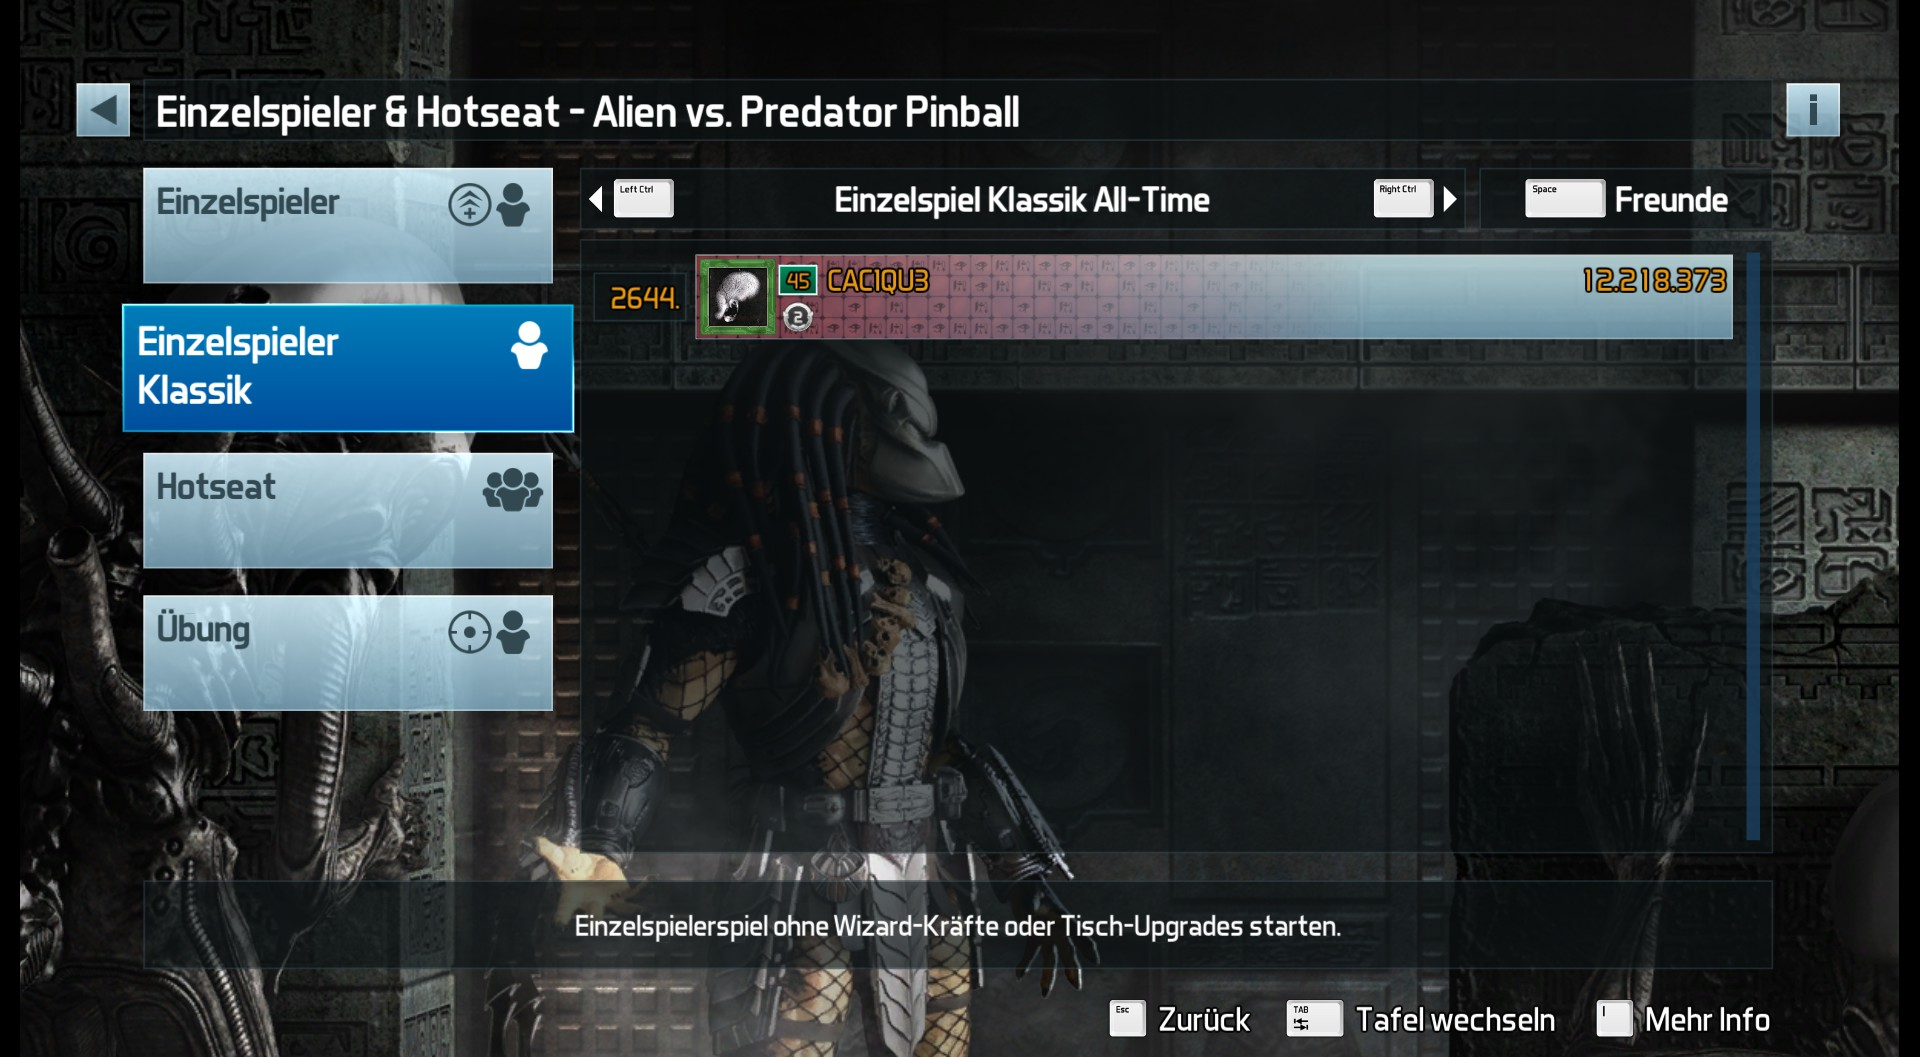 CAC1QU3: Pinball FX3: Alien vs. Predator Pinball [Classic] (PC) 12,218,373 points on 2019-03-19 09:36:14